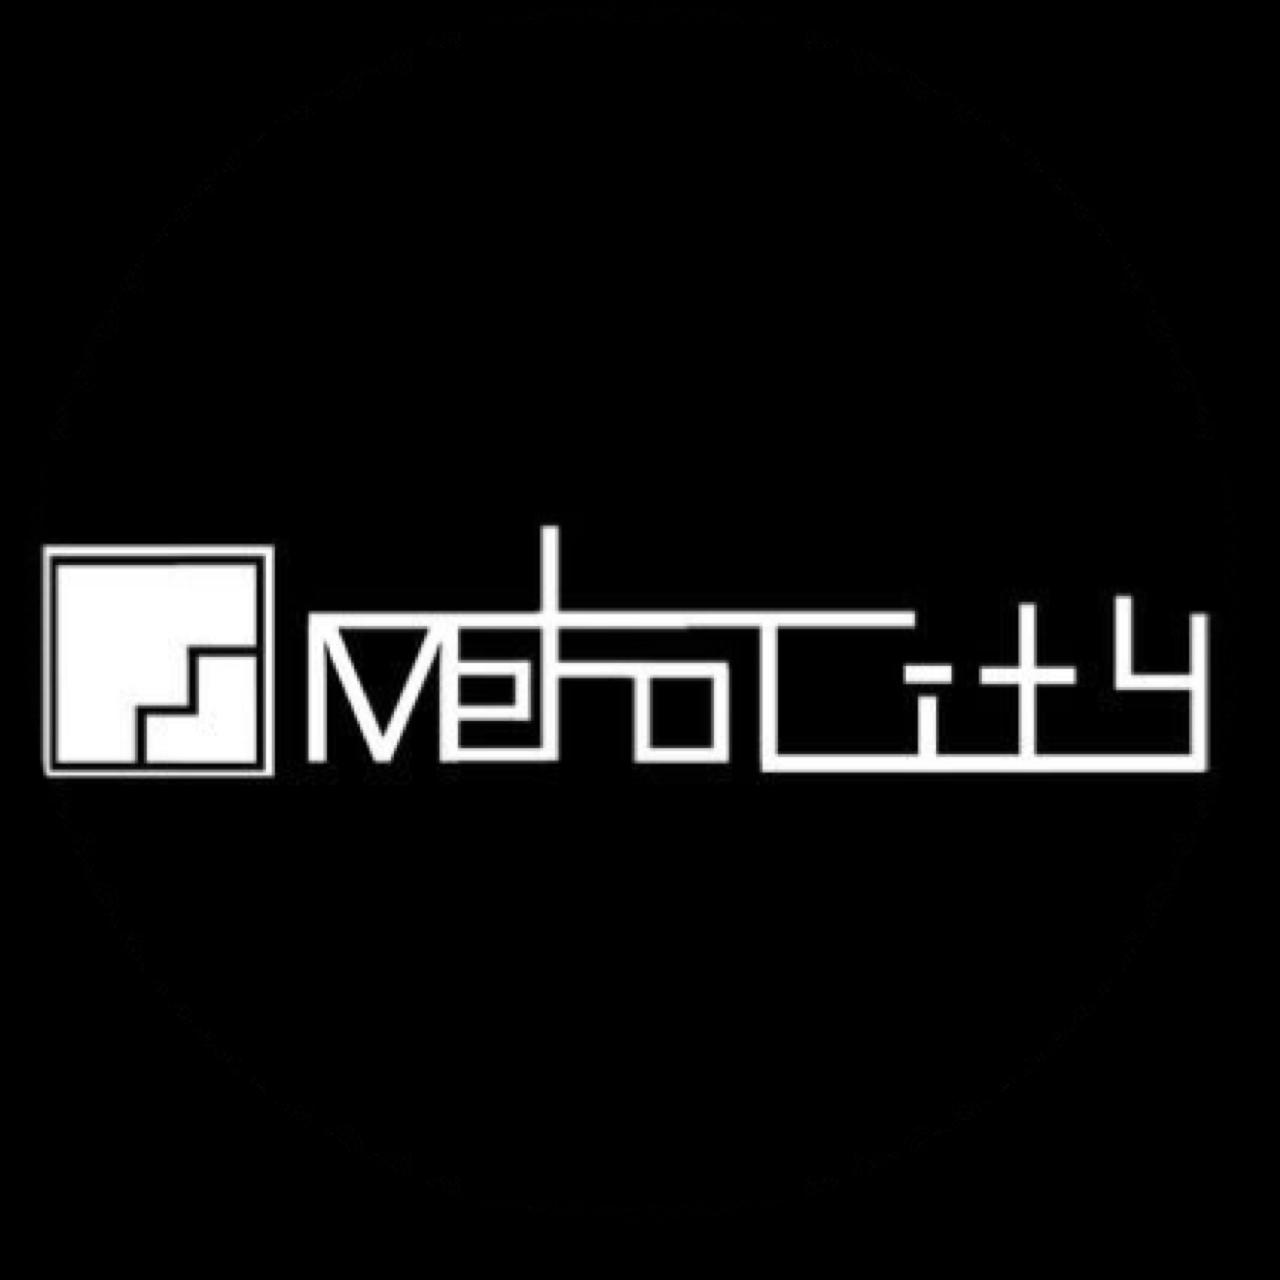 MetroCity オンラインストア